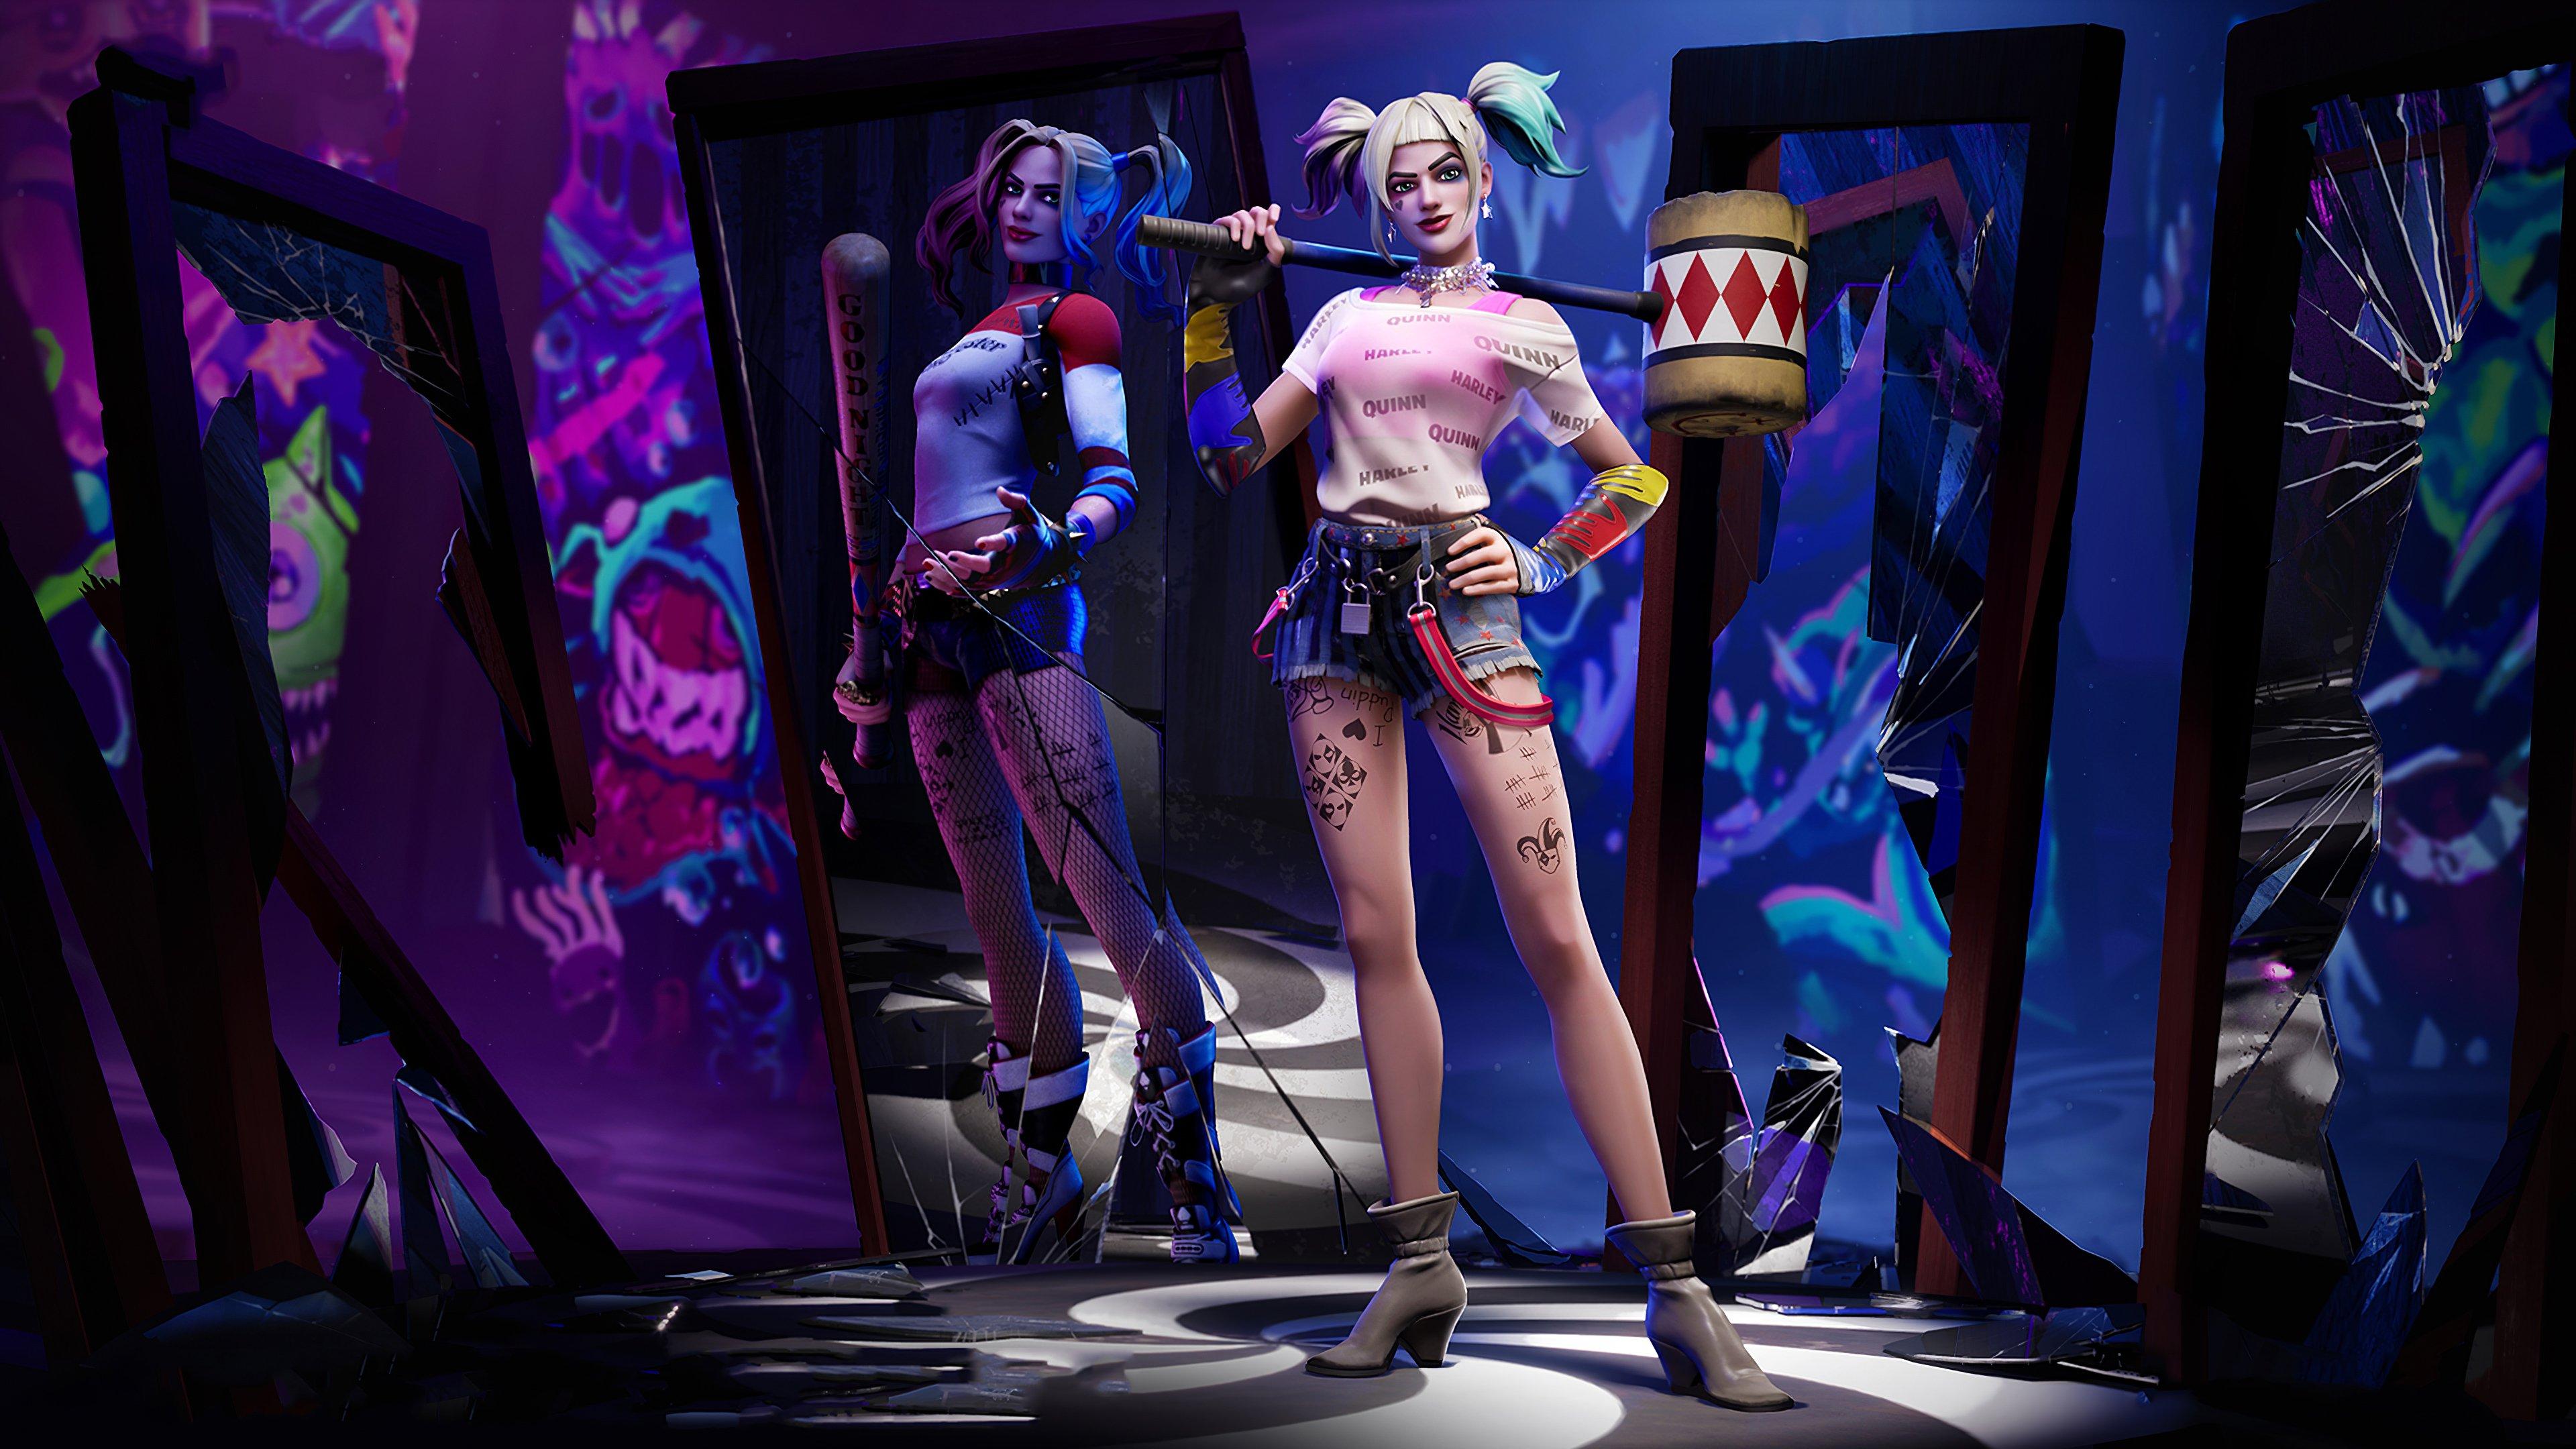 Fondos de pantalla Harley Quinn Fortnite